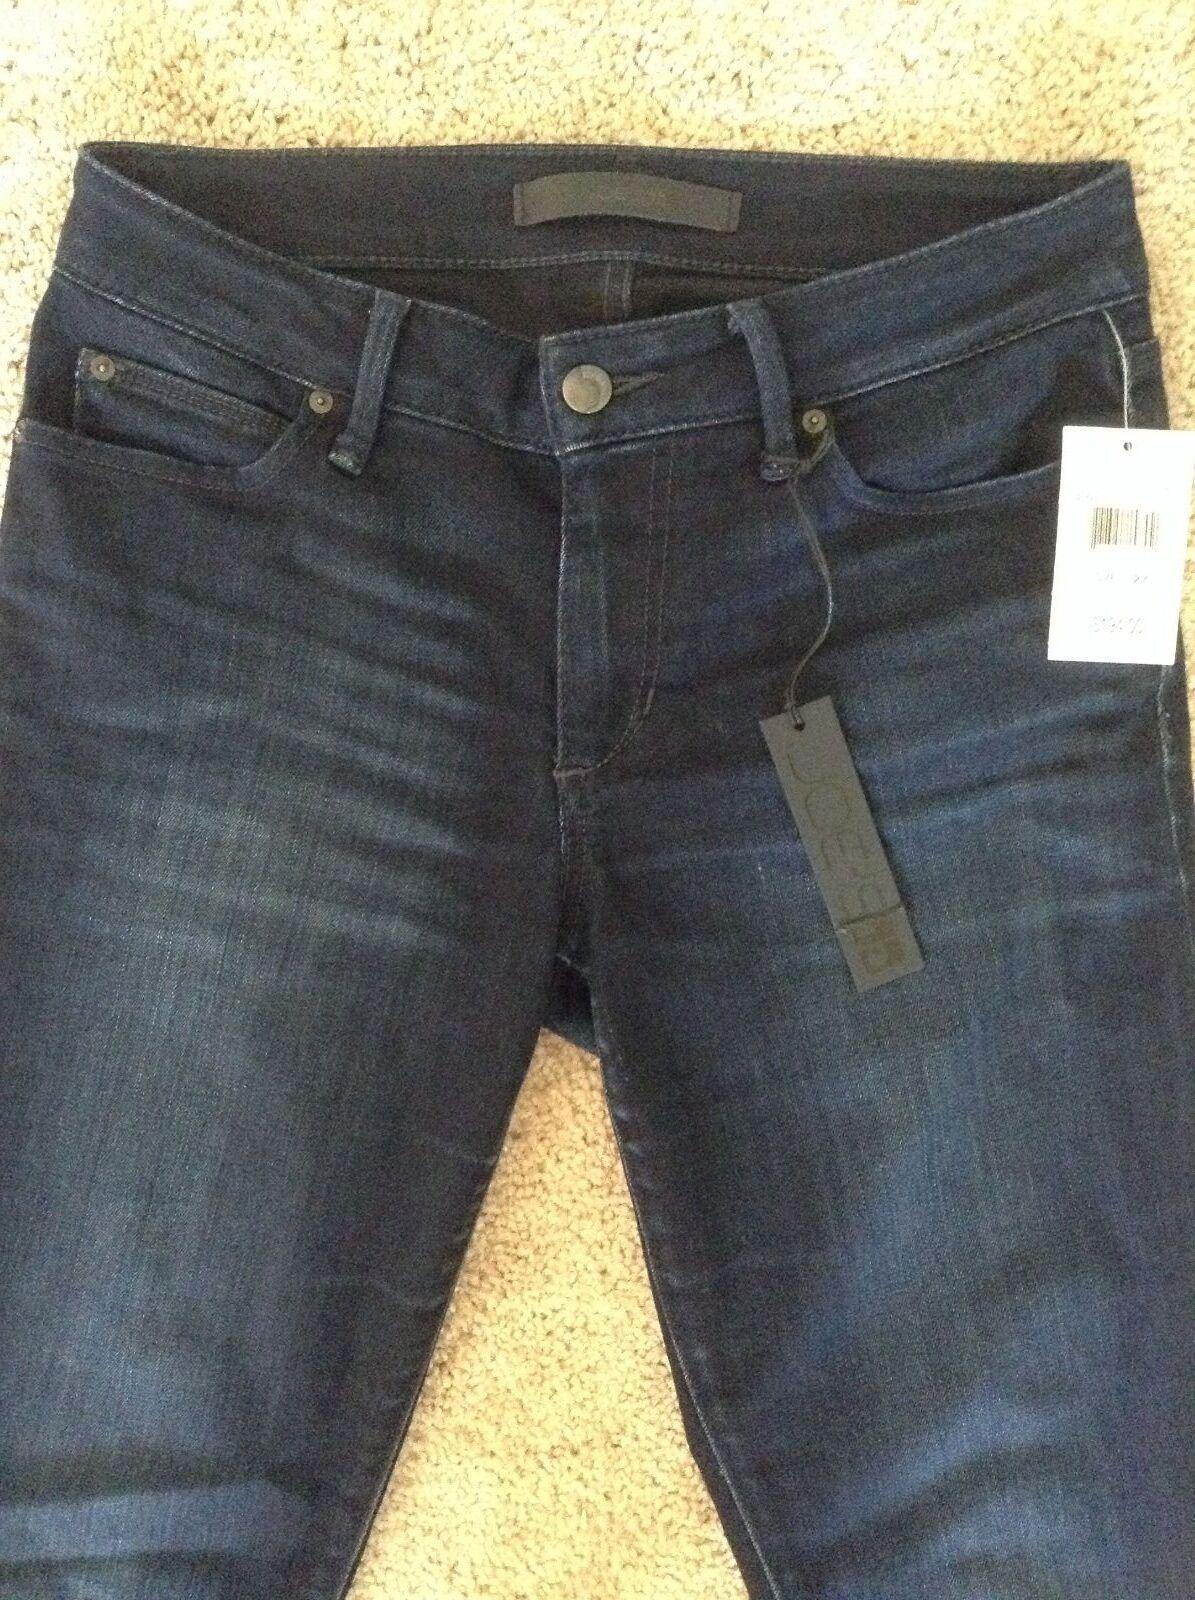 NWT Joe's Jeans  194 Flawless Honey Curvy Skinny Jeans Dark Wash27 waist